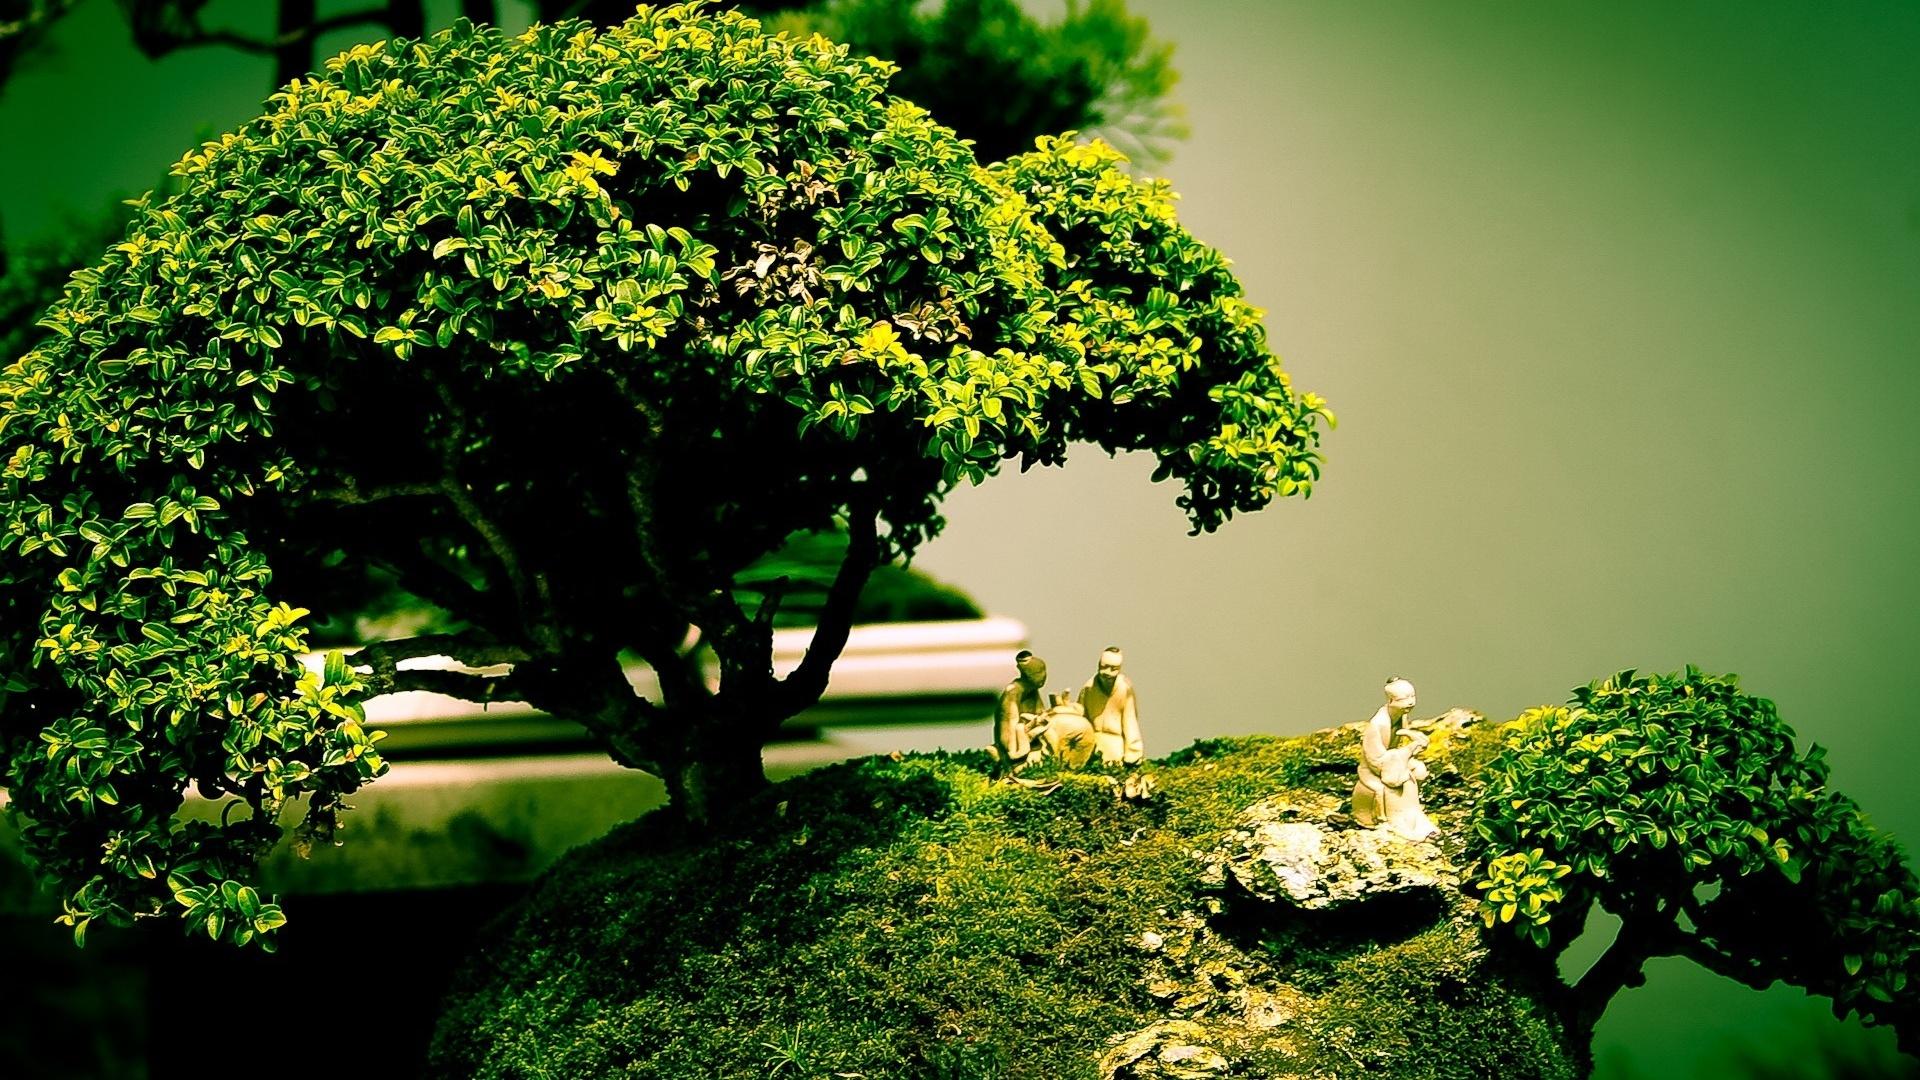 bonsai-tree-art-1920x1080-wallpaper-wp3803386